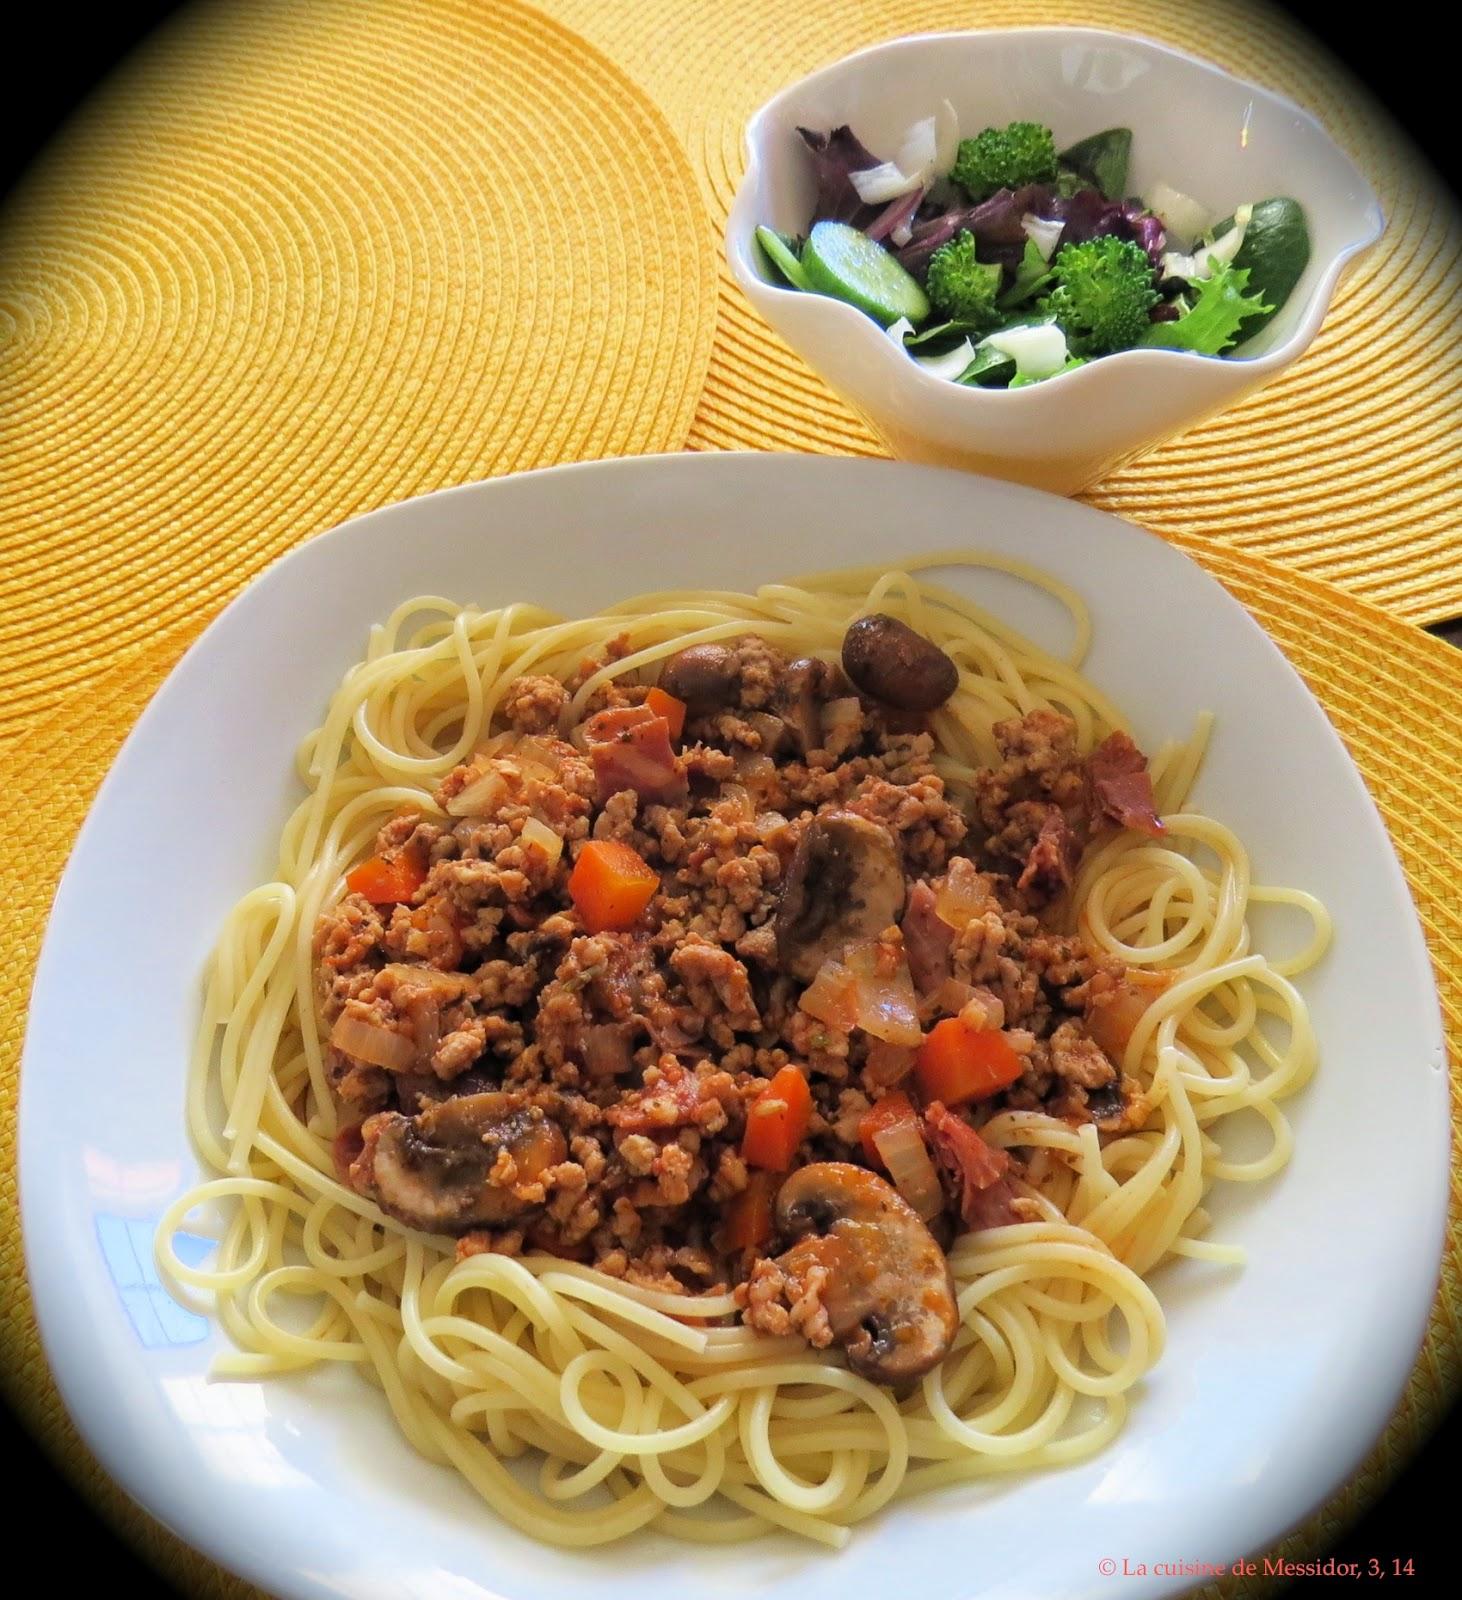 la cuisine de messidor sauce spaghetti la bi re et au prosciutto. Black Bedroom Furniture Sets. Home Design Ideas